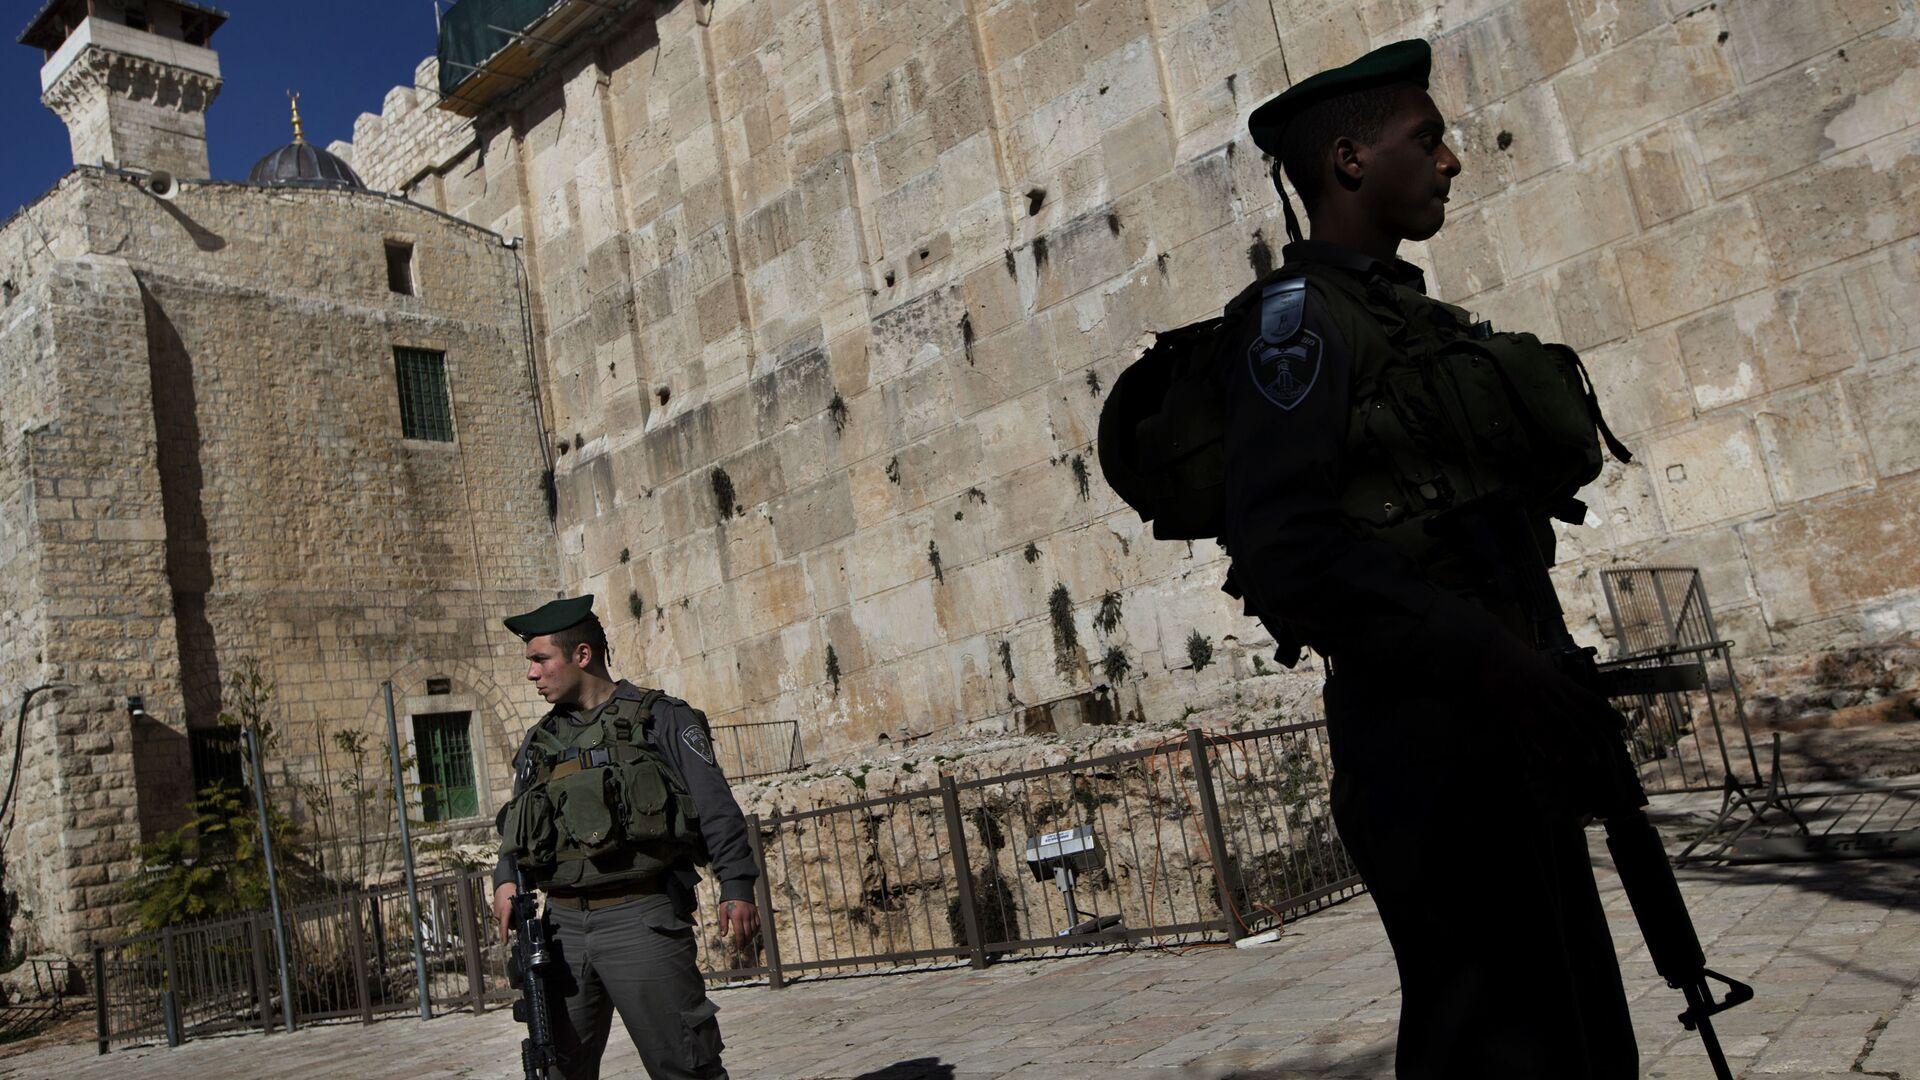 Militares israelíes cerca de la mezquita de Abrahán en Hebrón - Sputnik Mundo, 1920, 09.09.2021